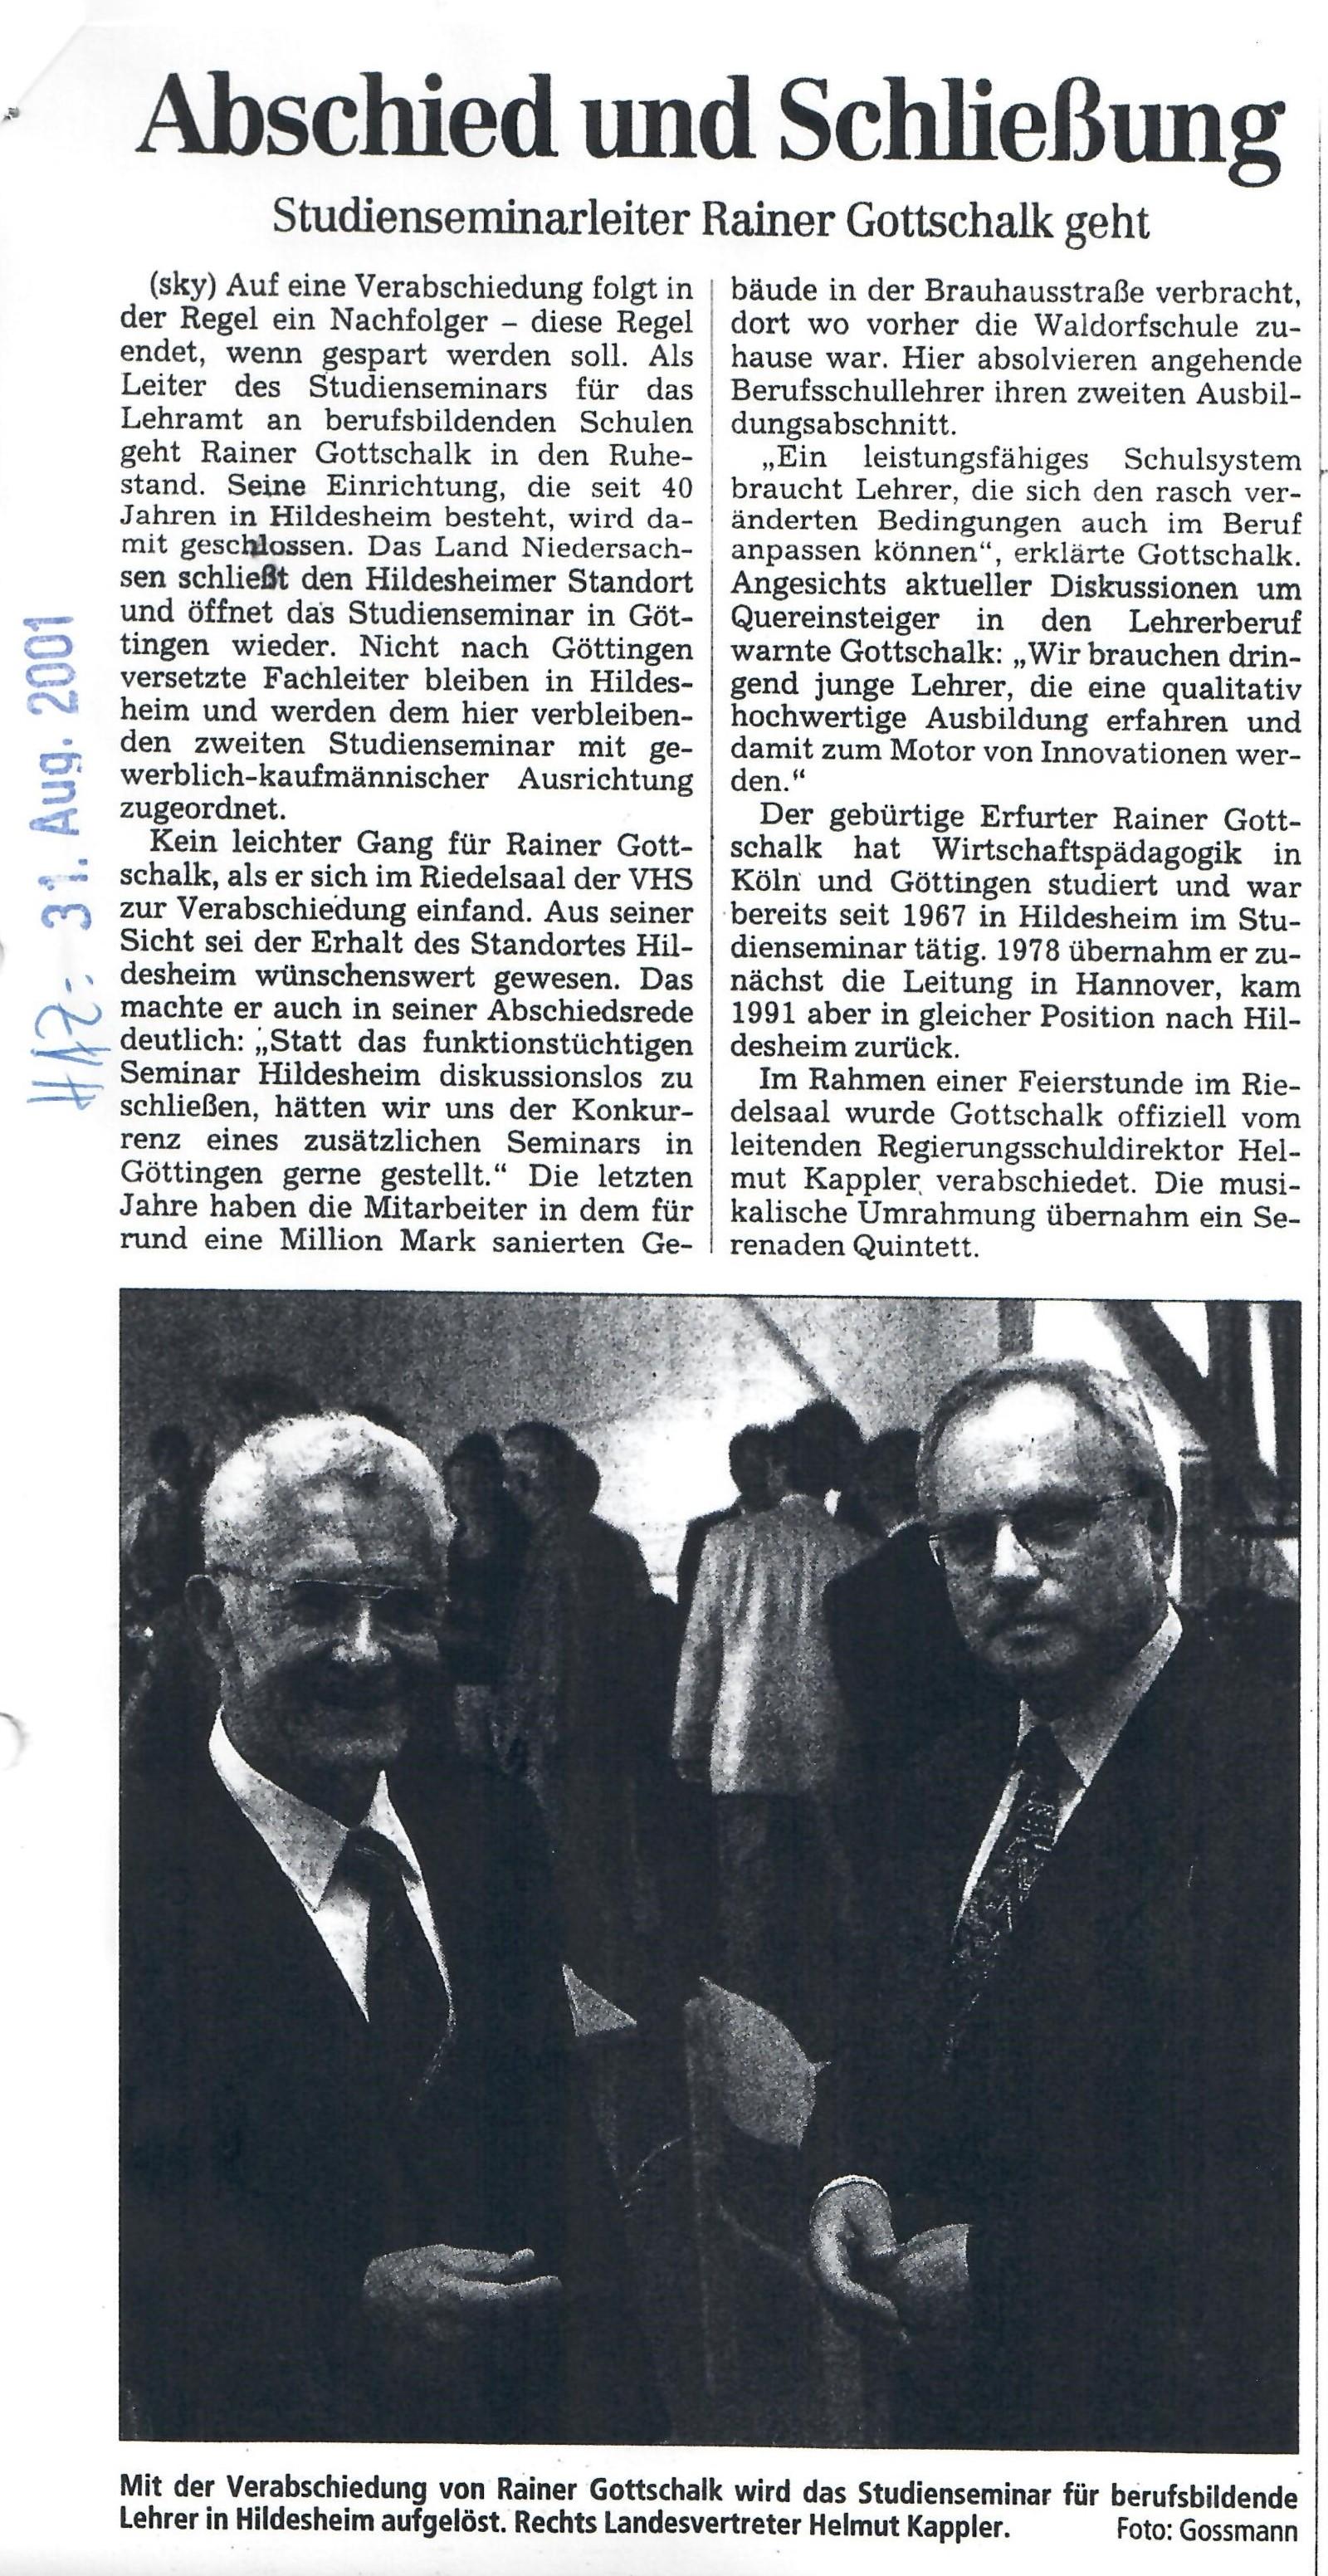 images/Seminarchronik/2001_Verabschiedung_Gottschalk_HAZ.jpg